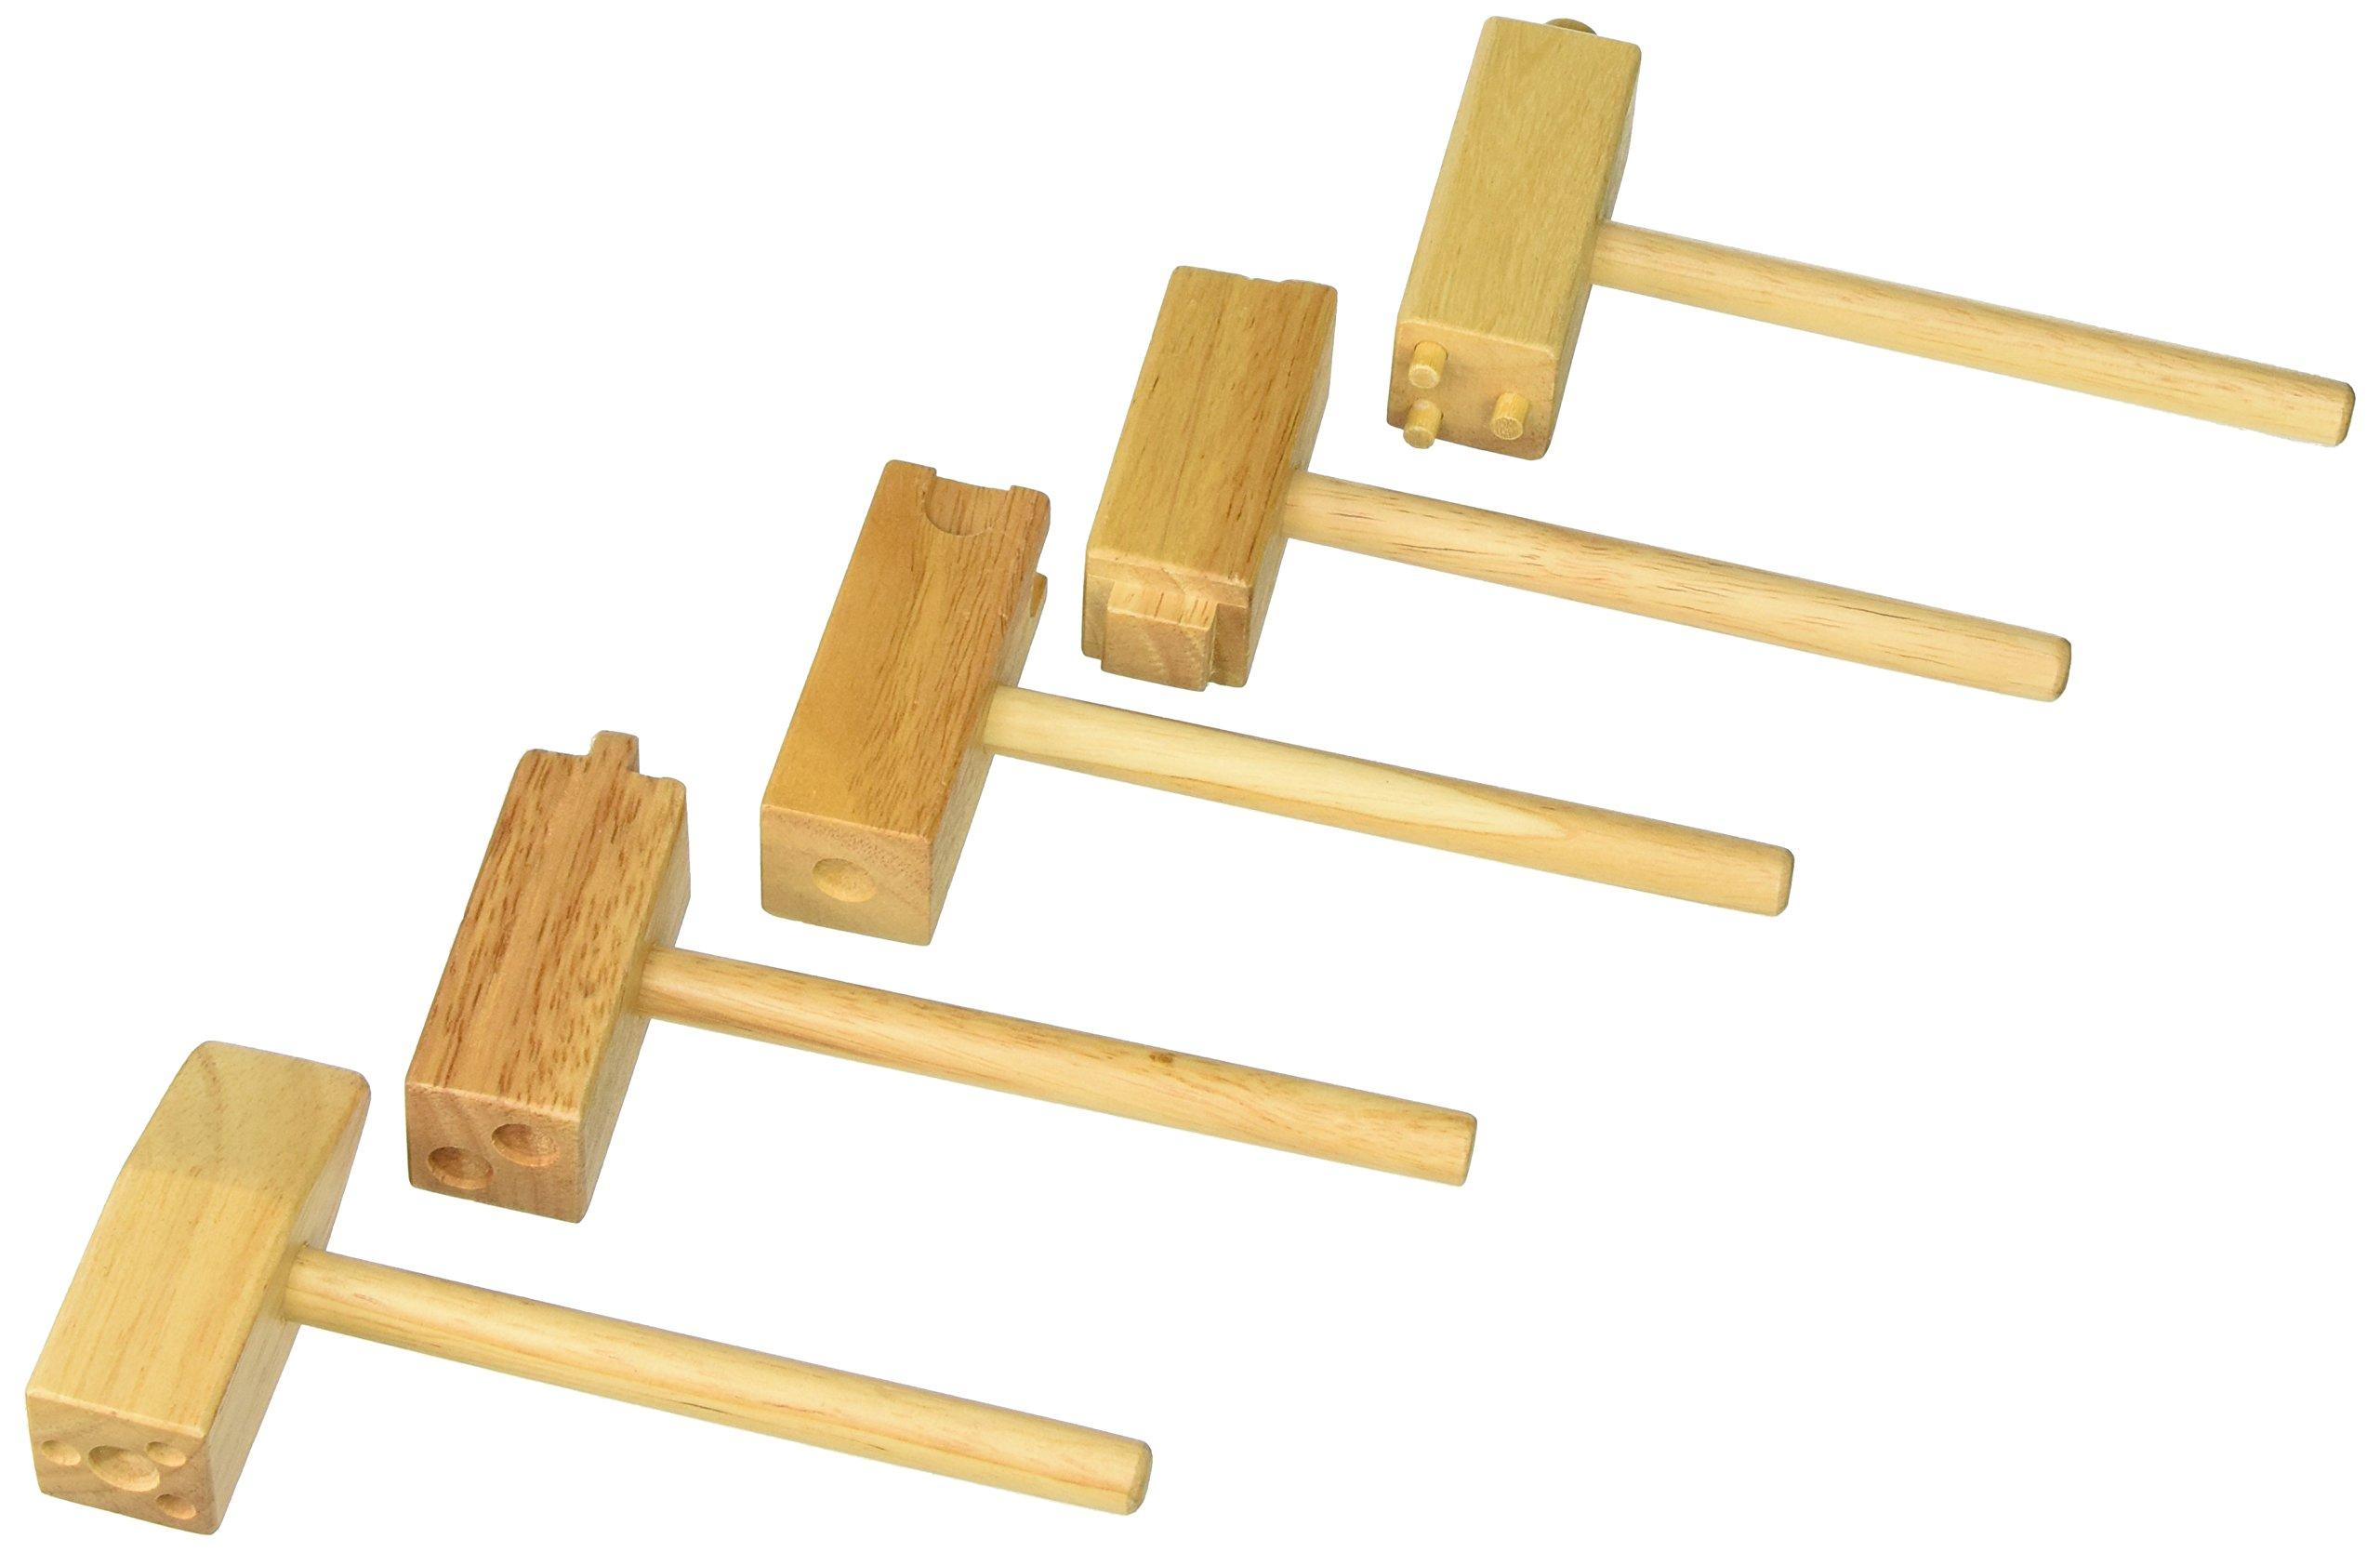 Creativity Street Wood Clay Hammer Set, Set of 5 by Creativity Street